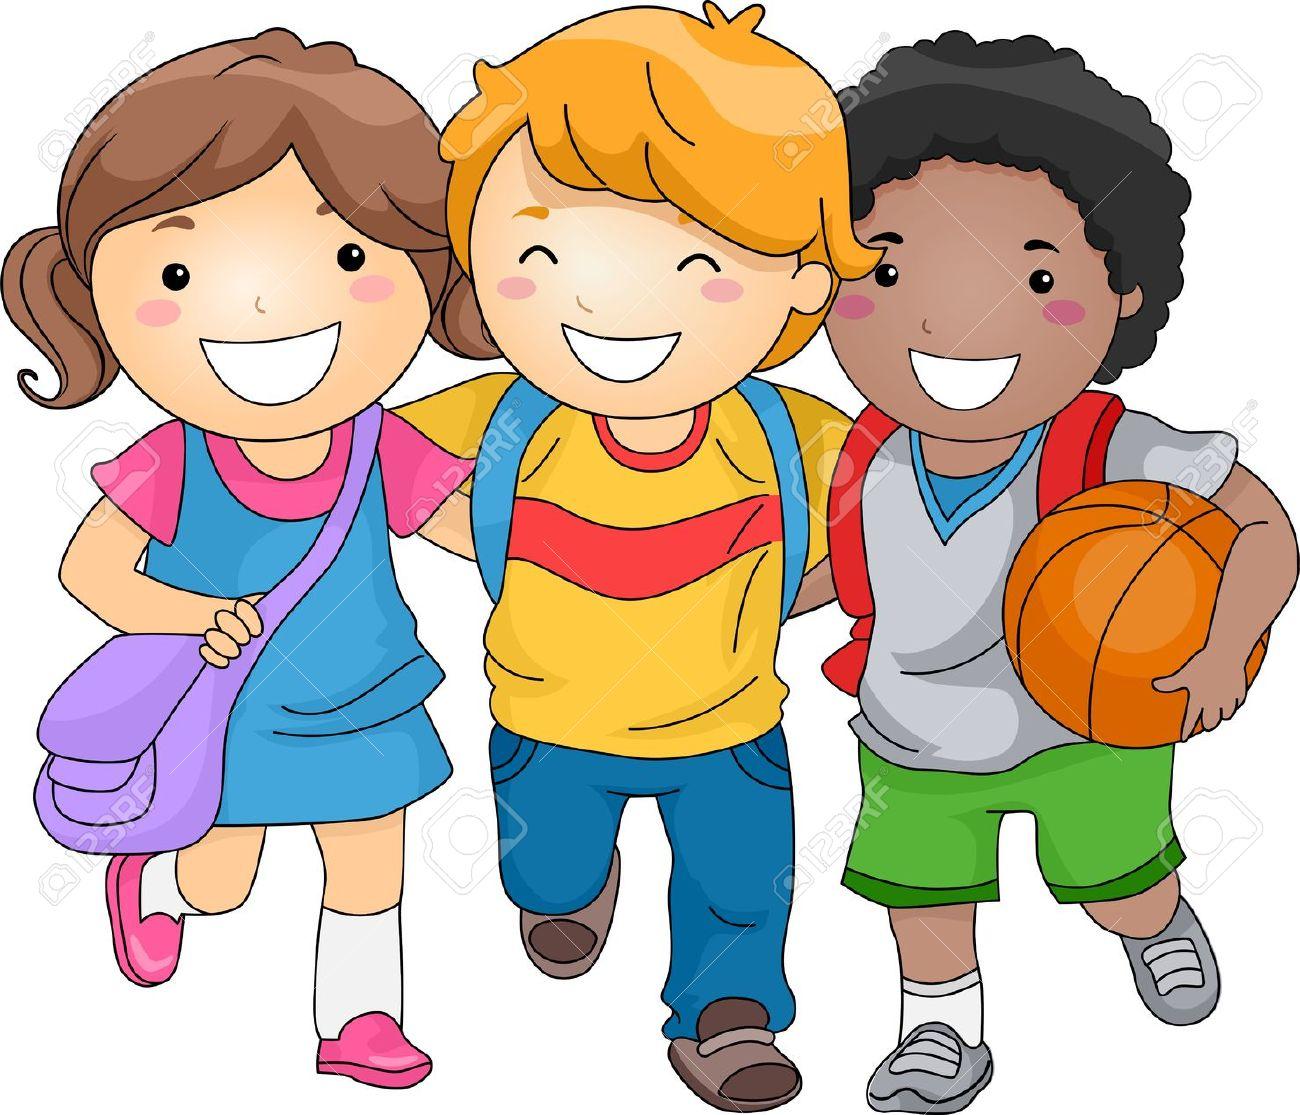 School Kids Clip Art - ClipArt Best